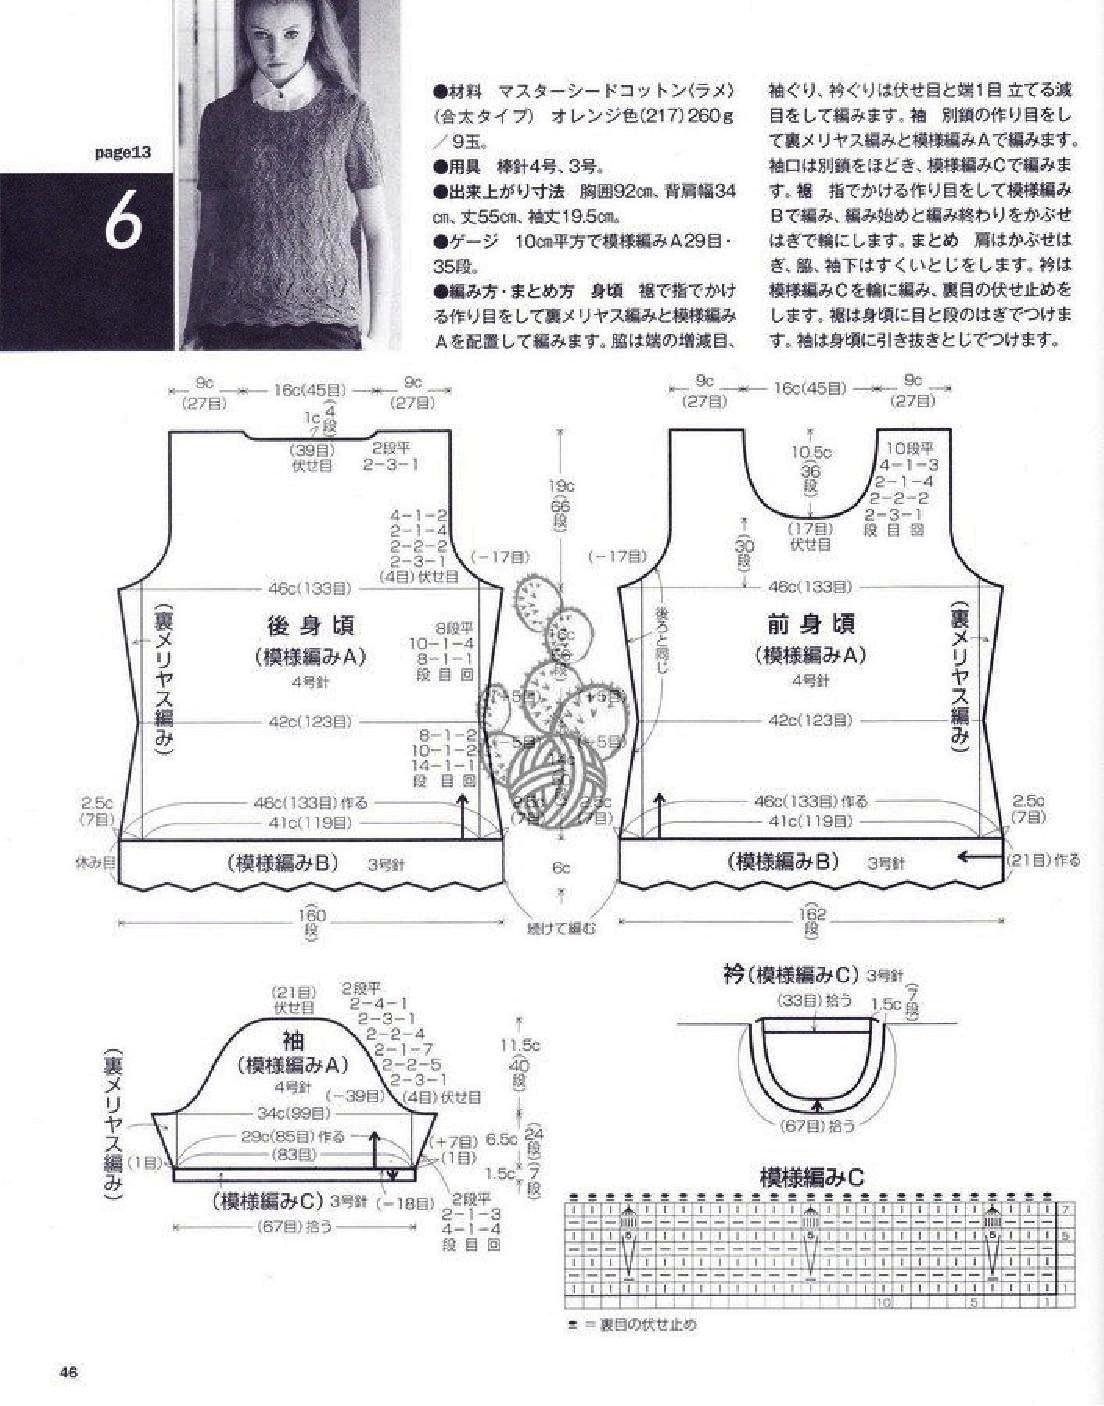 NV80258_page46_image1.jpg